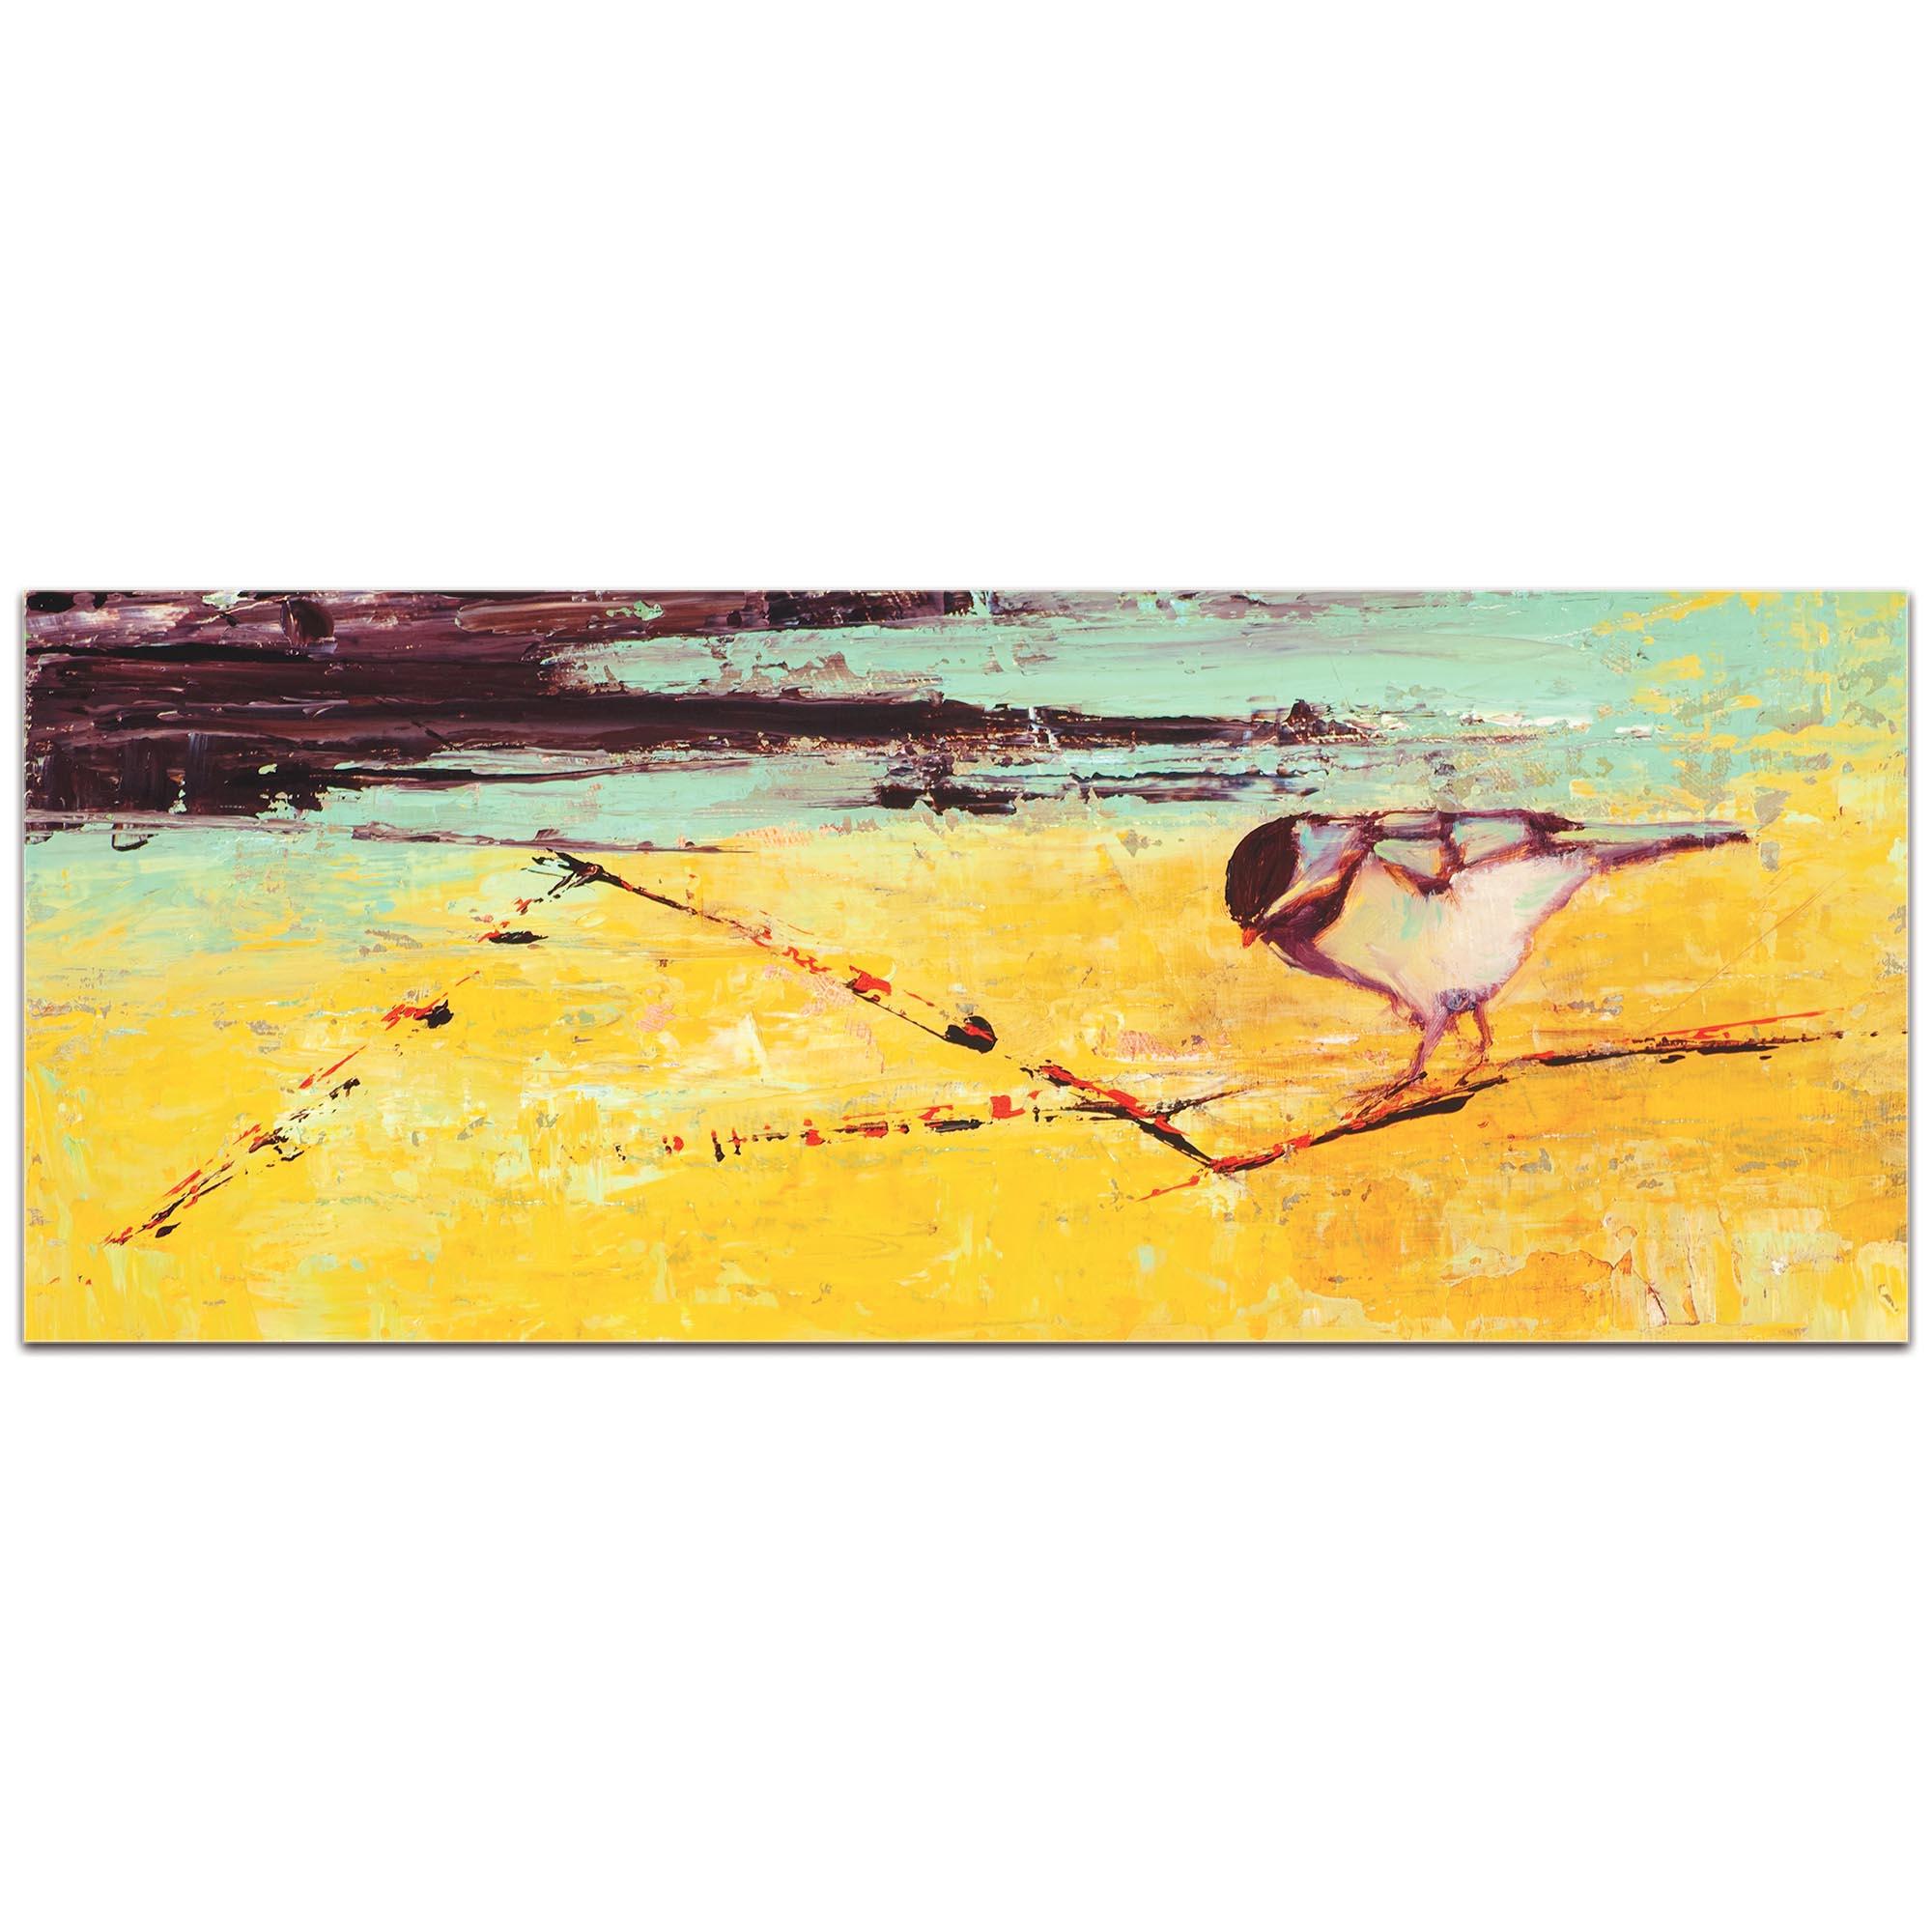 Contemporary Wall Art 'Bird on a Horizon v2' - Urban Birds Decor on Metal or Plexiglass - Image 2